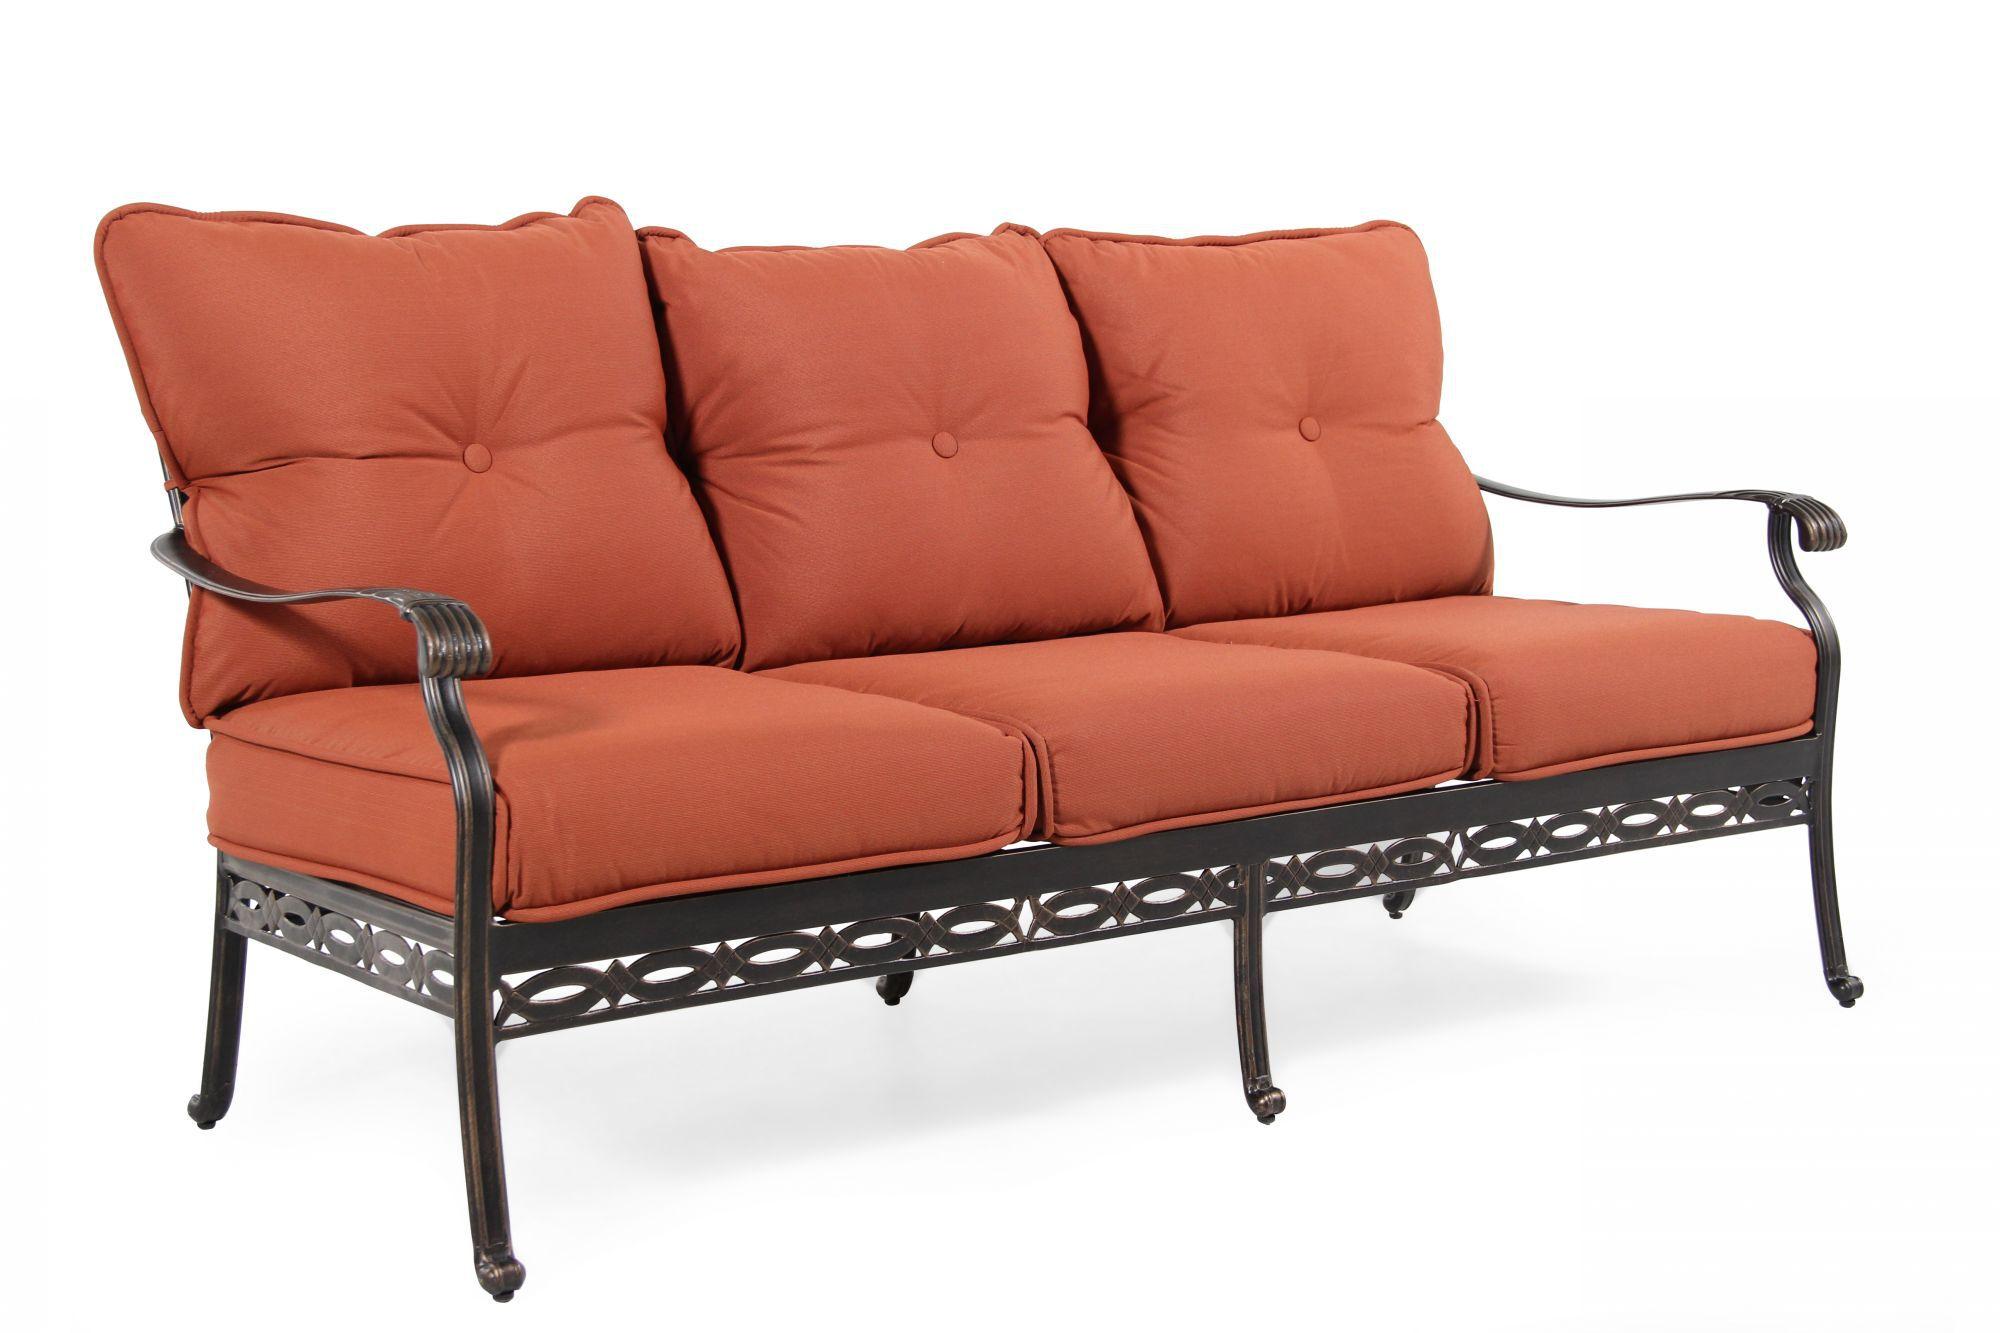 button tufted sofas ashley furniture levon charcoal sofa aluminum in orange mathis brothers